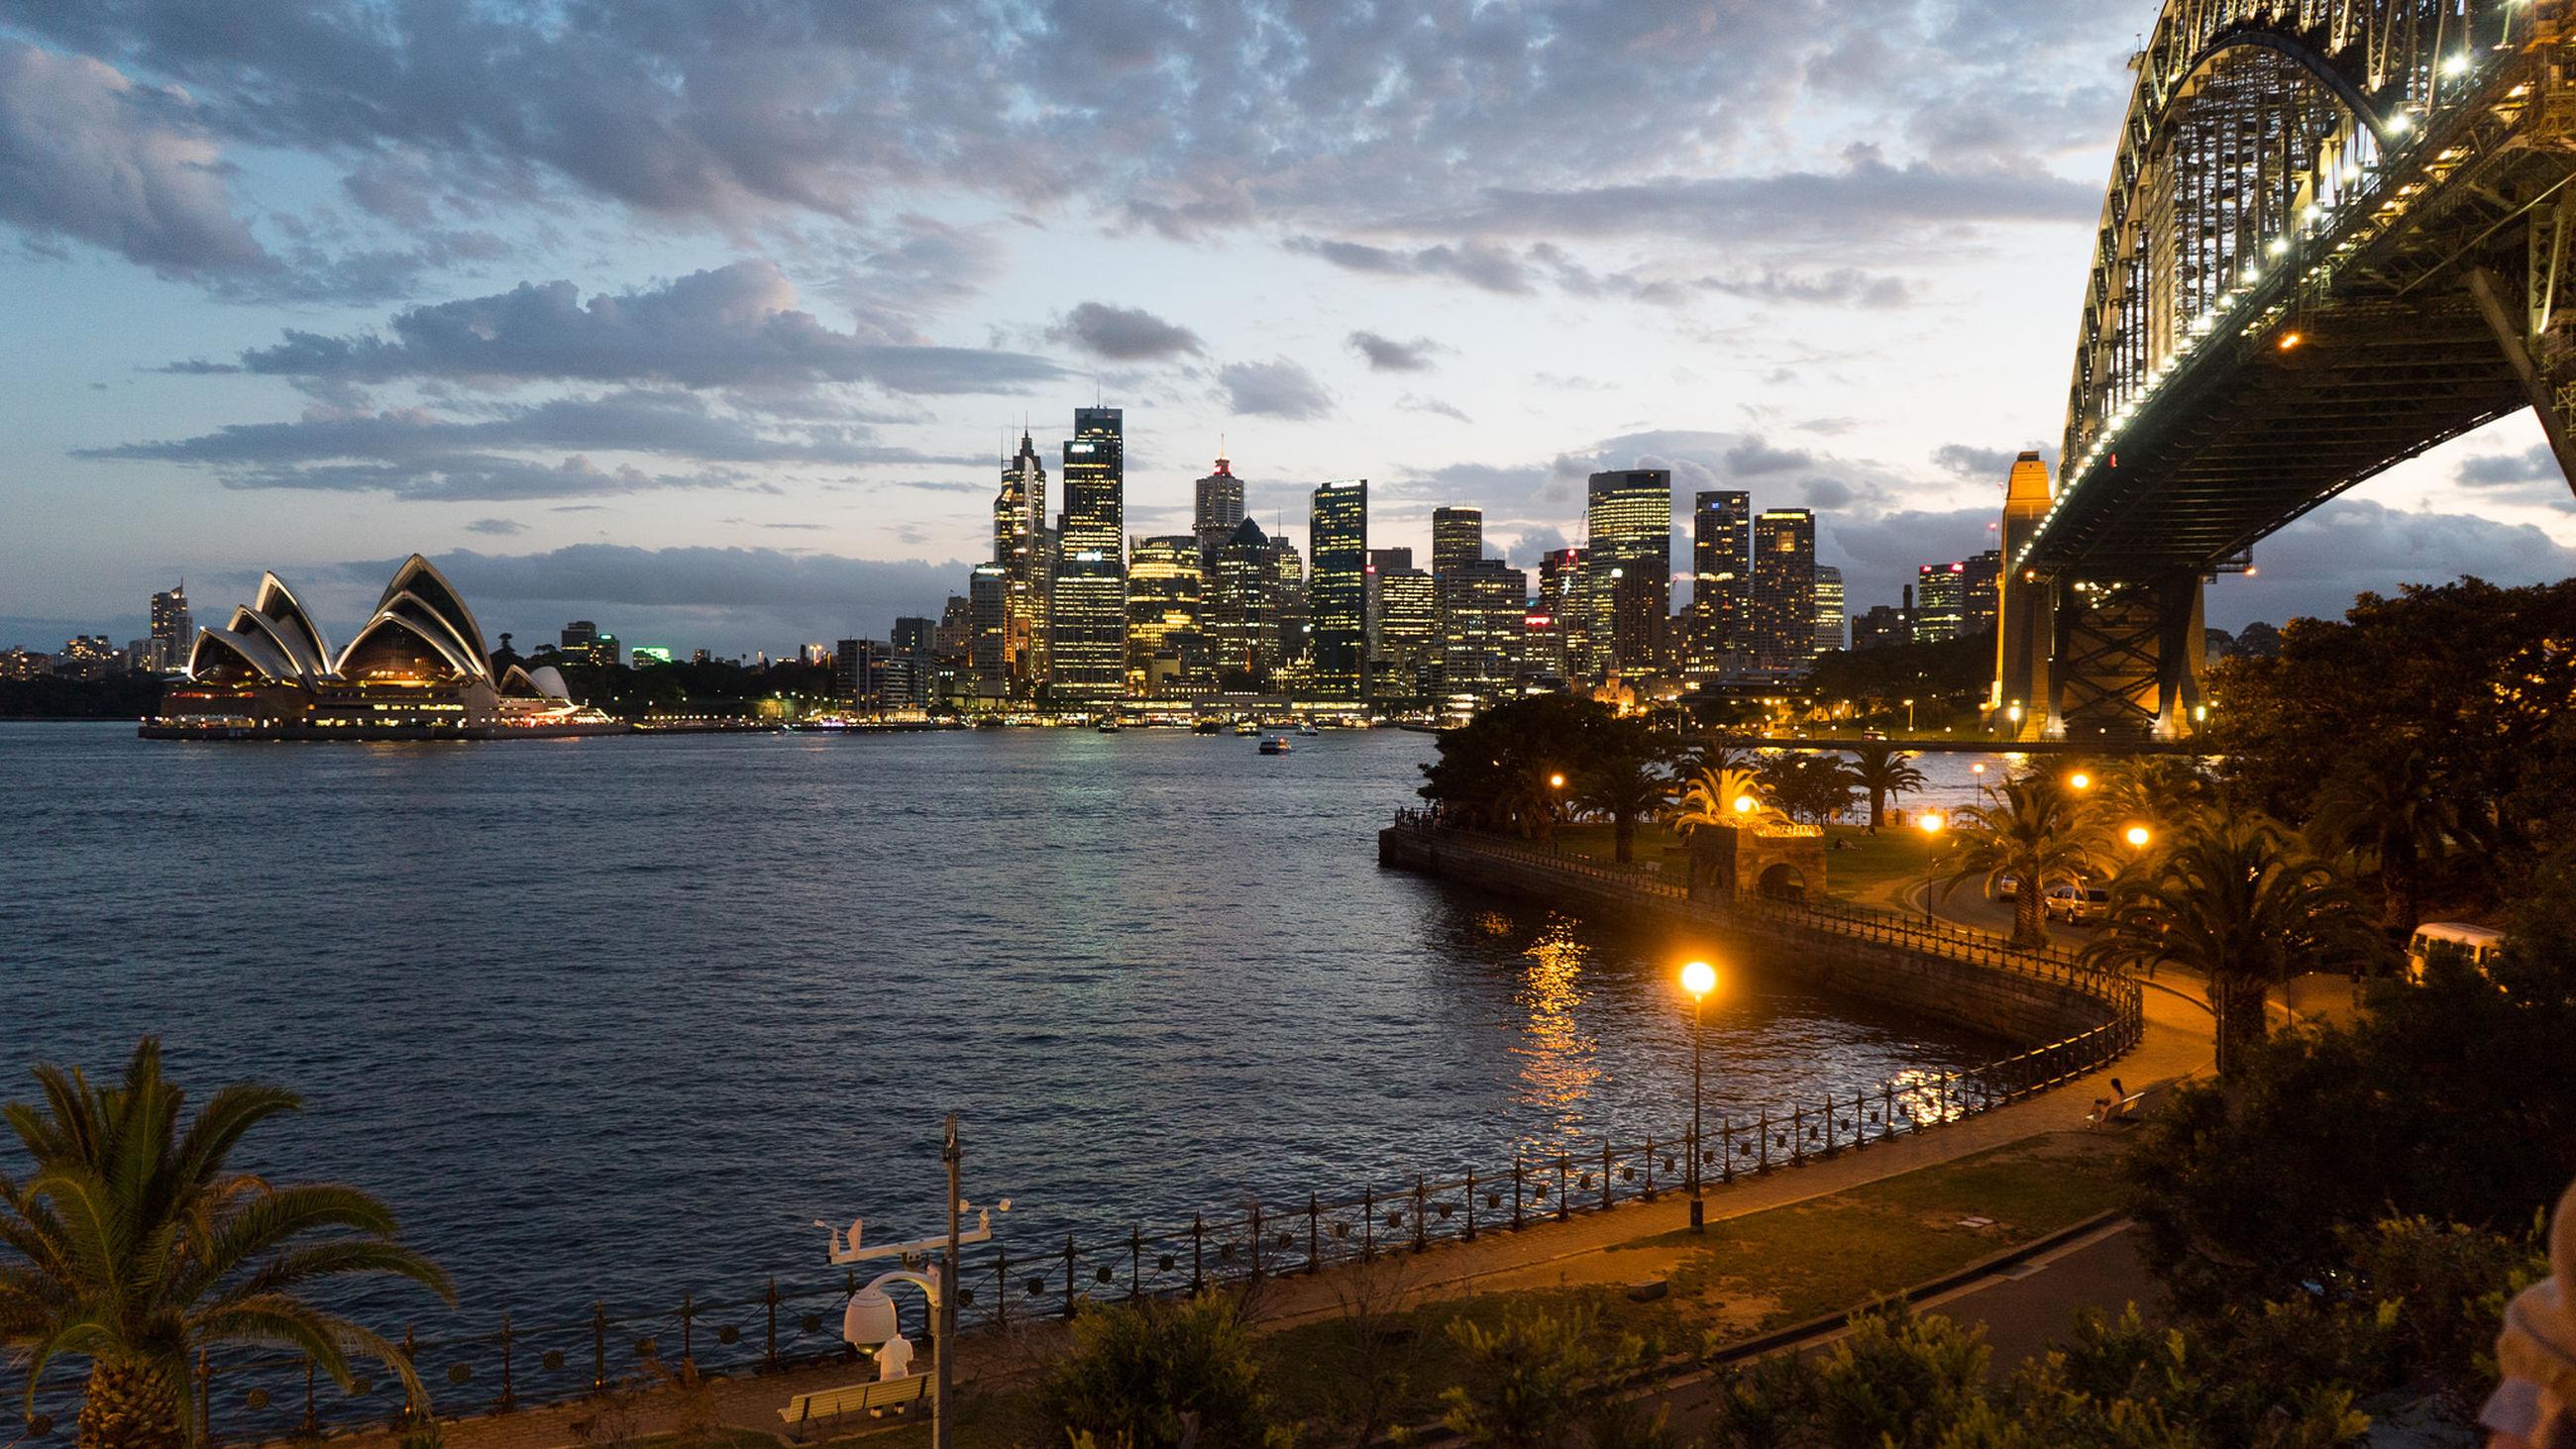 Illuminated sydney harbor bridge over sea by opera house and city skyline against sky